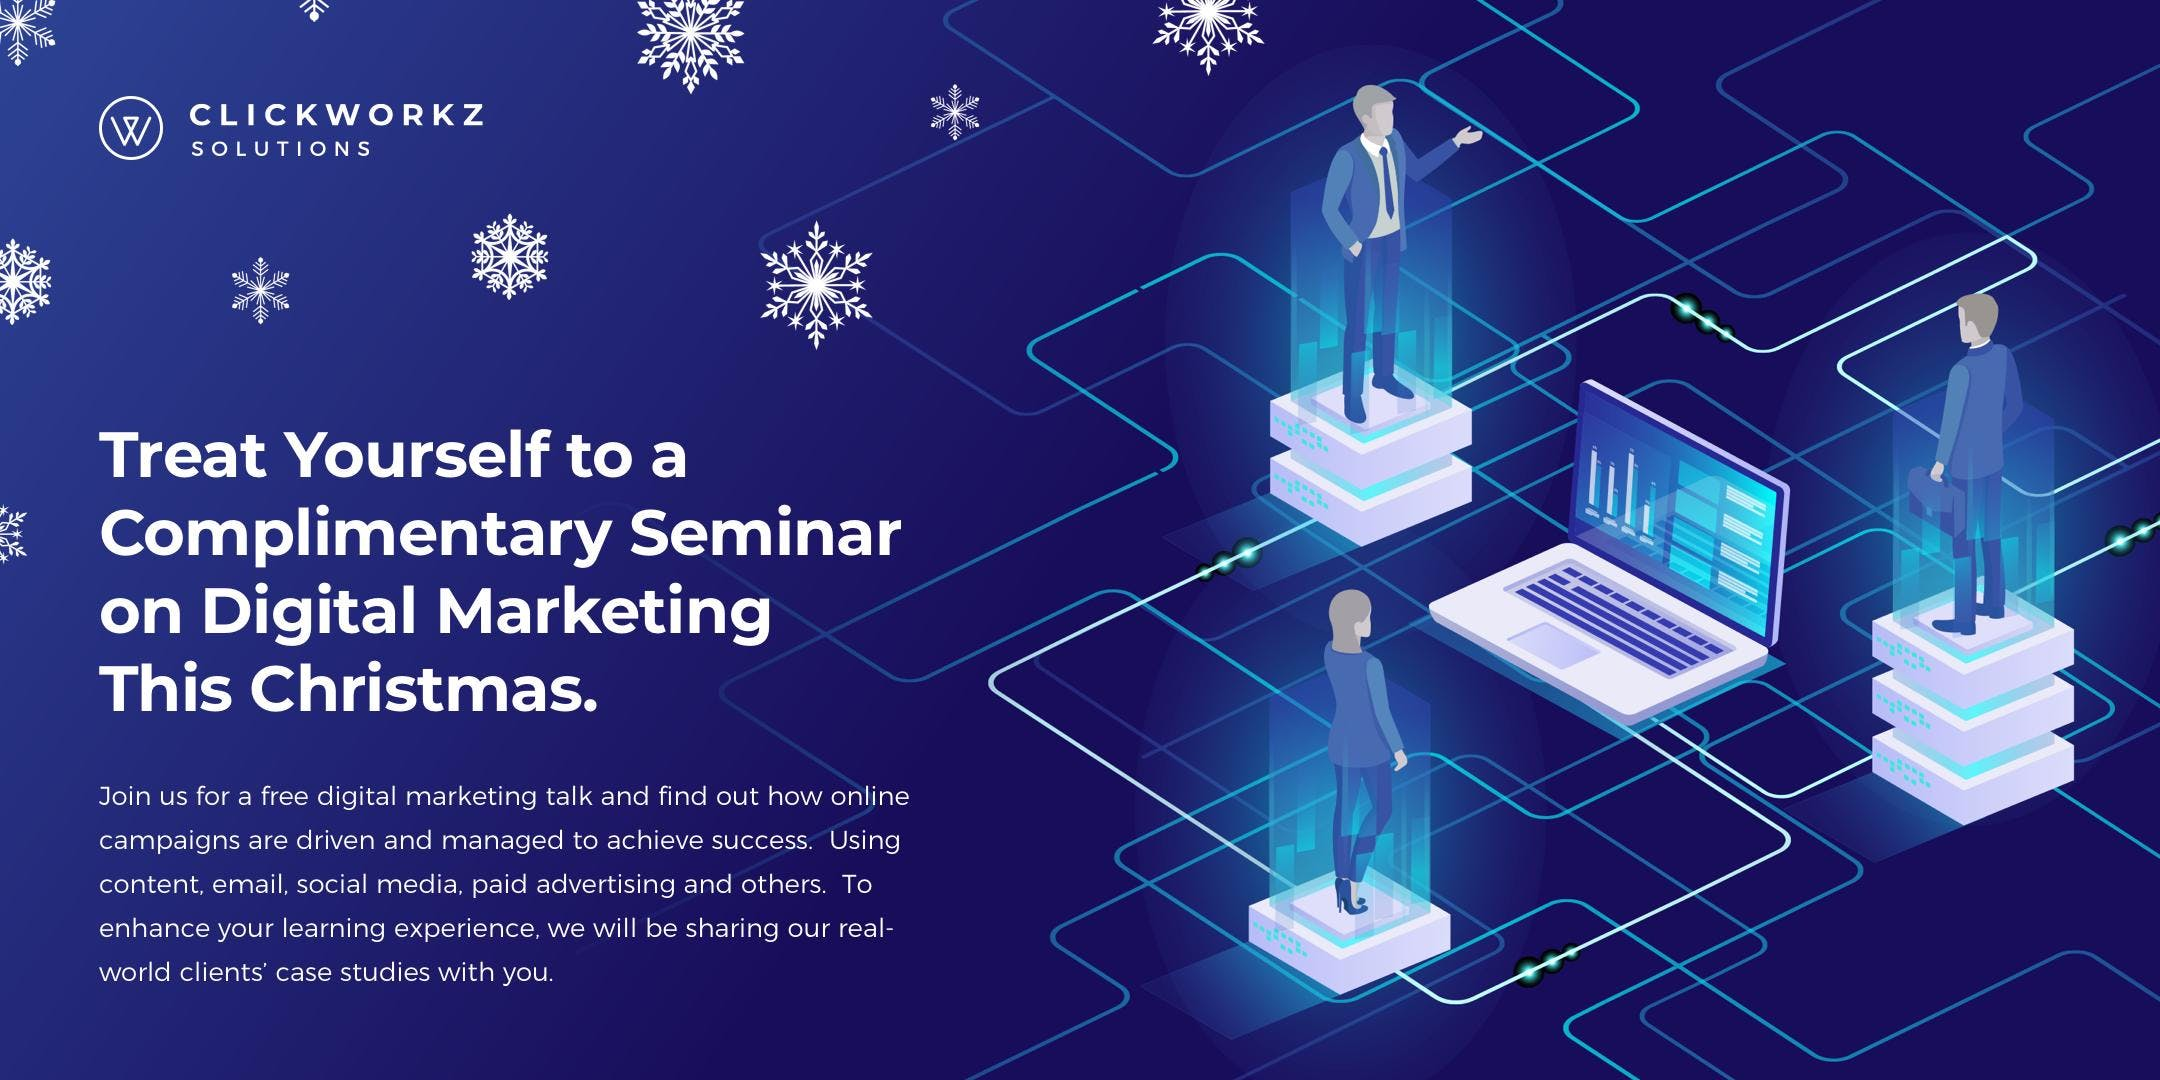 Complimentary Seminar on Digital Marketing